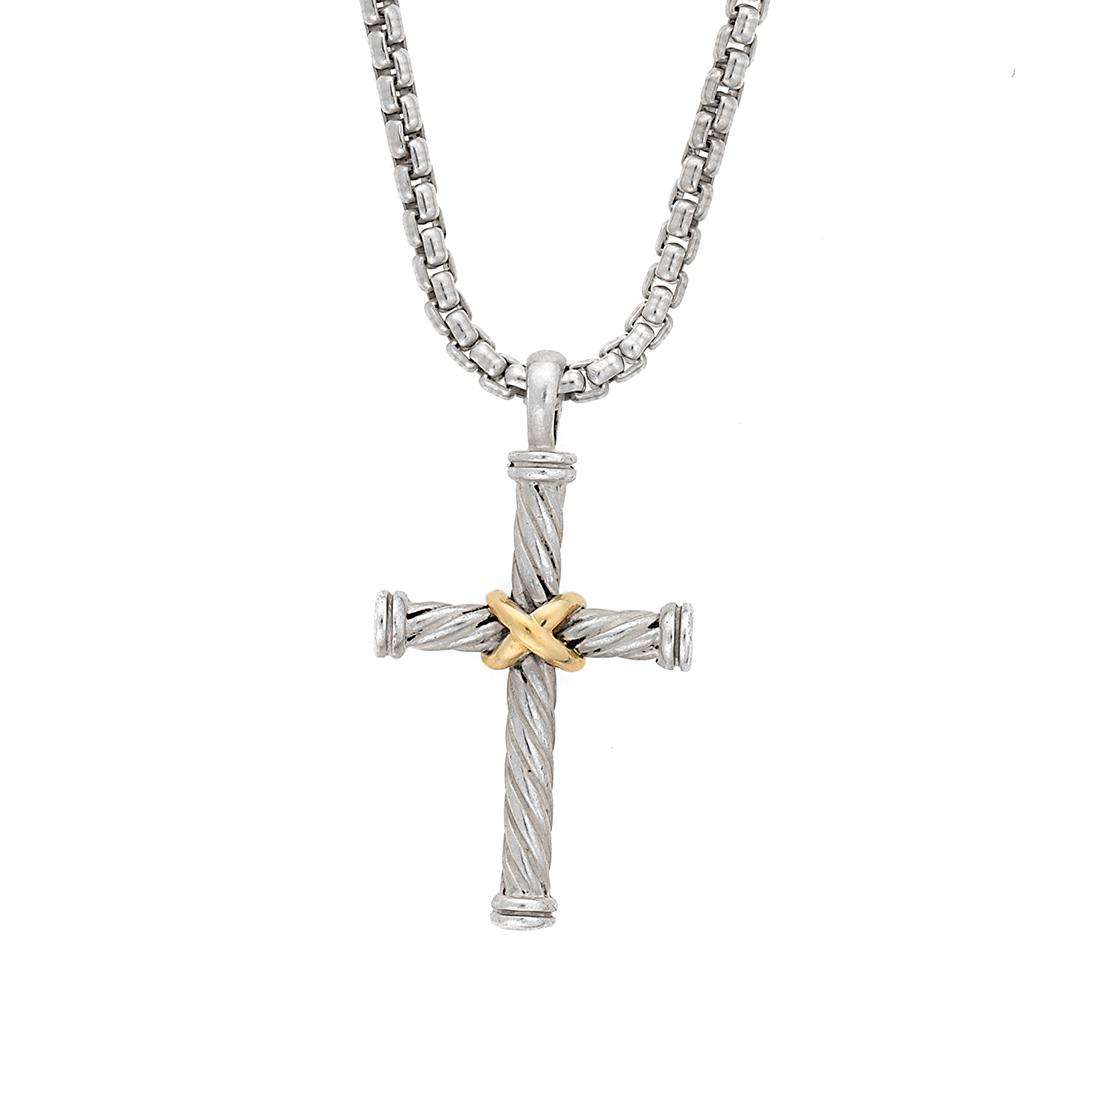 DAVID YURMAN Sterling /& 18Kt Gold Cable Cross Pendant